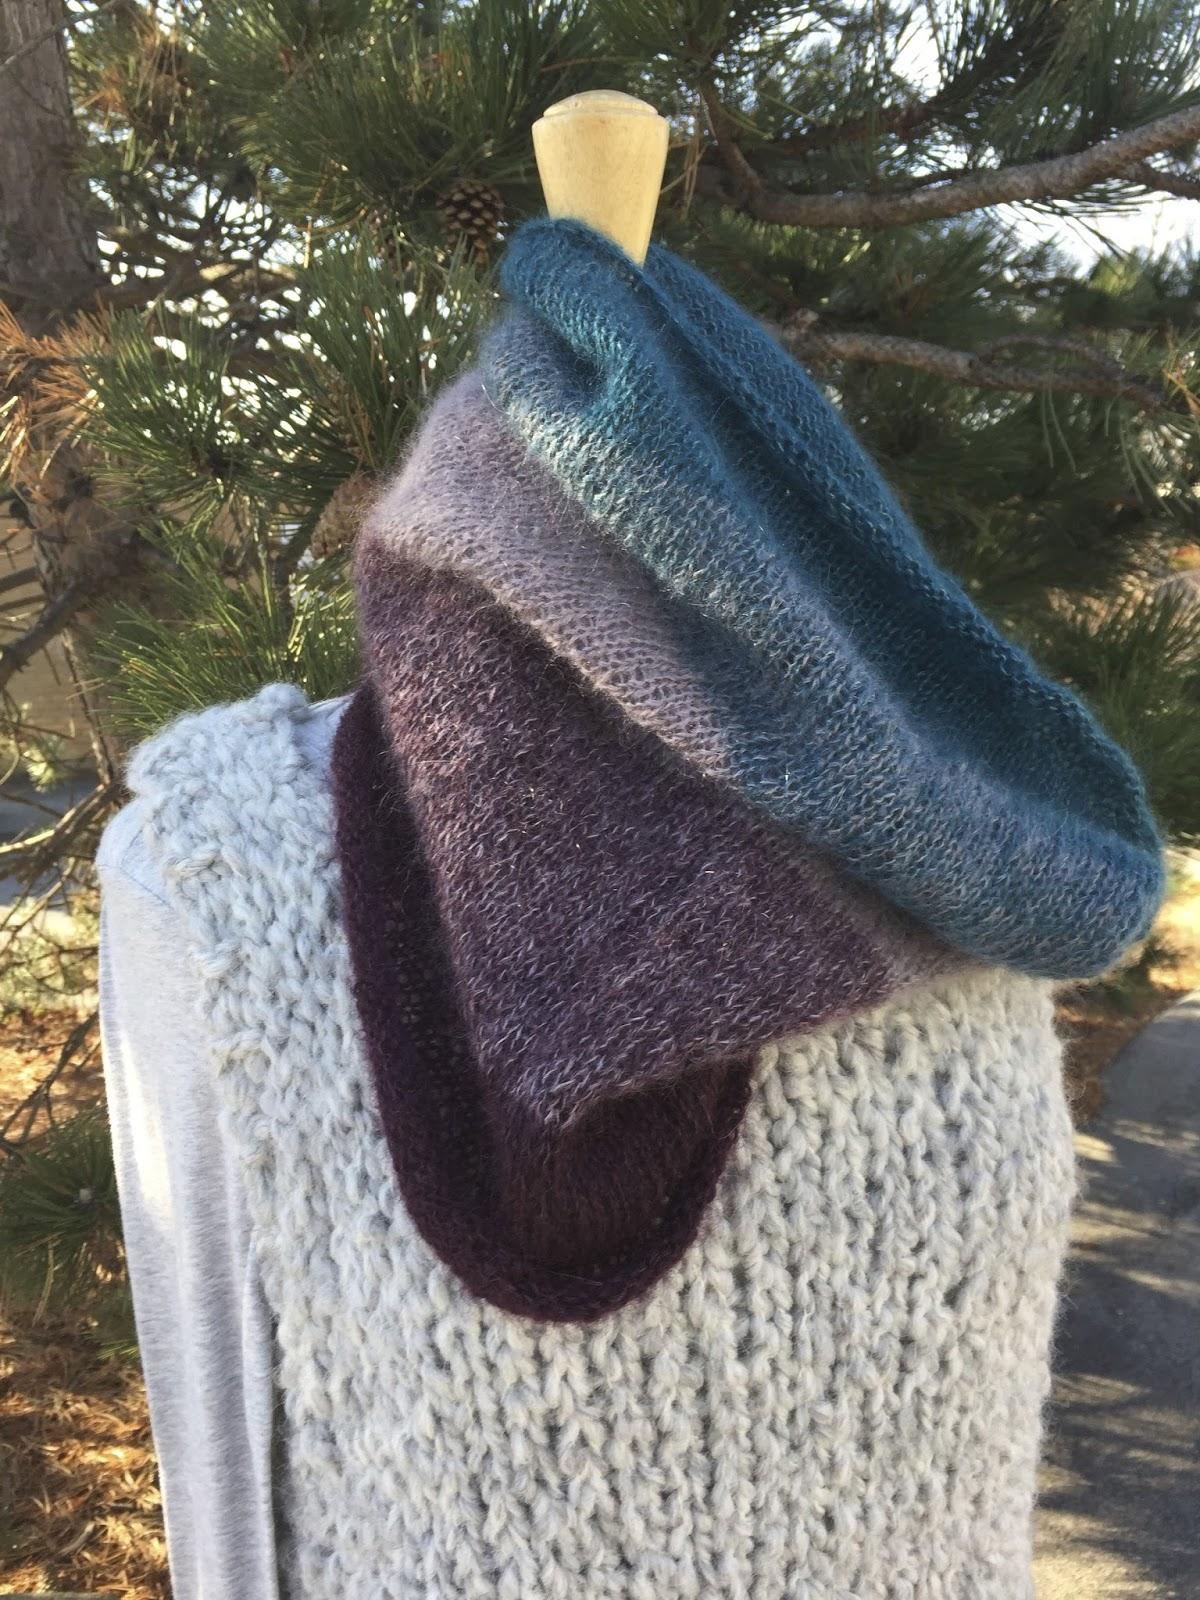 A Really Good Yarn: Ombre Cowl Hood